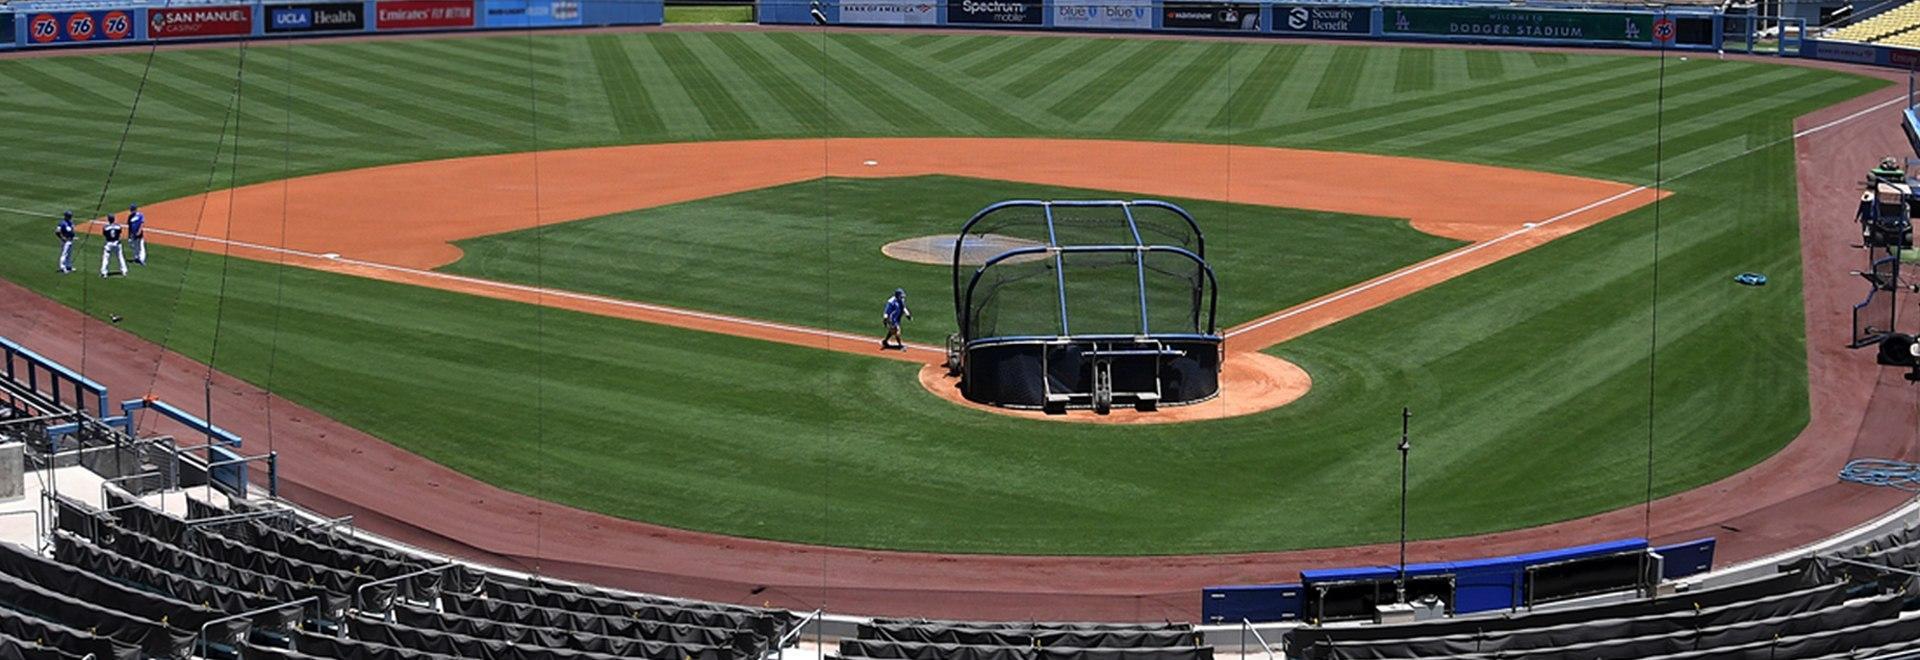 LA Dodgers - Tampa Bay. World Series Game 7